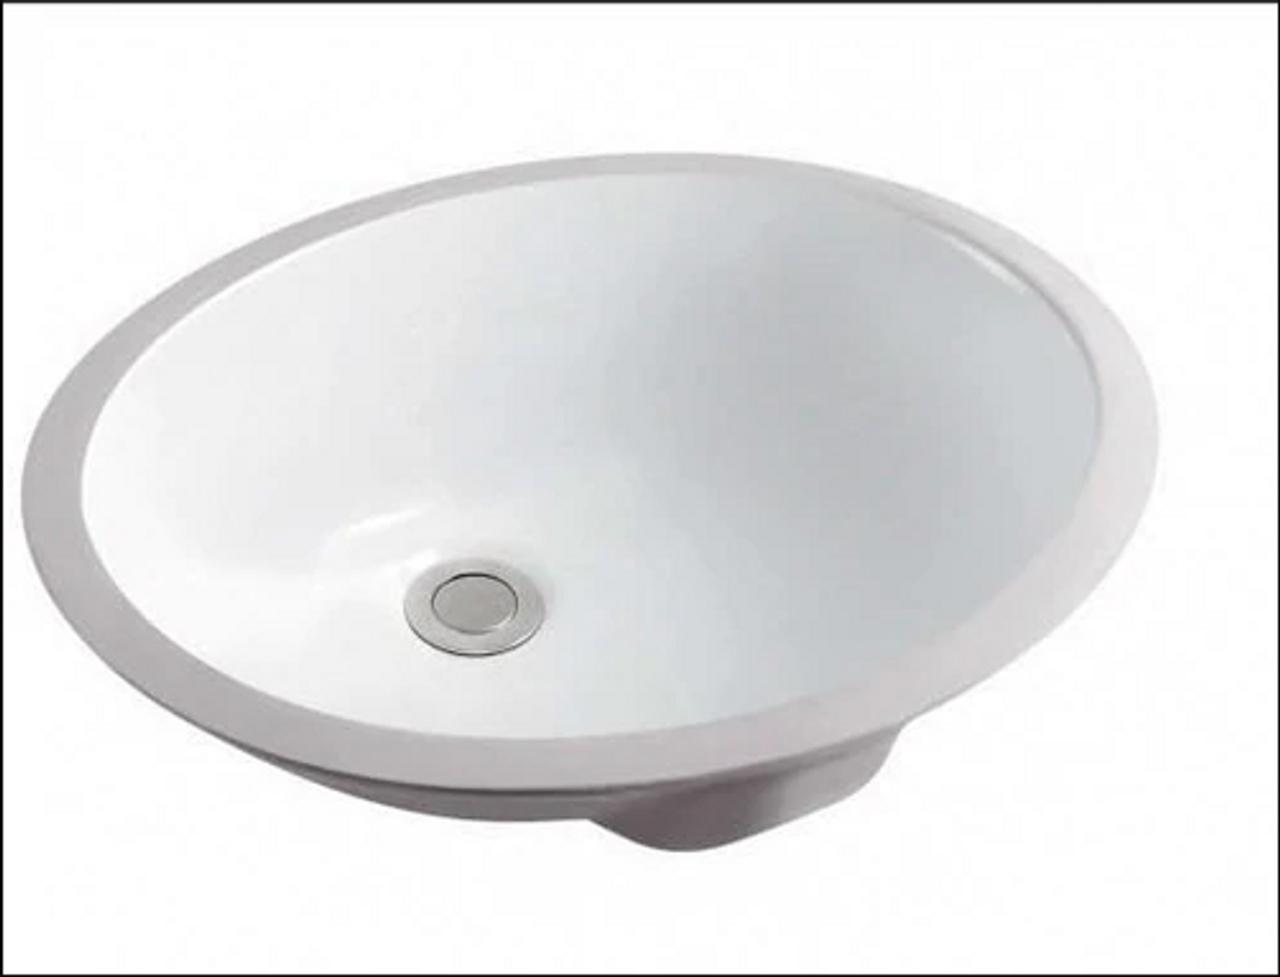 Rocket Sink White Vanity Sink 17 X 14 Inch Rocket Supply Stone Tile Concrete Supply Denver